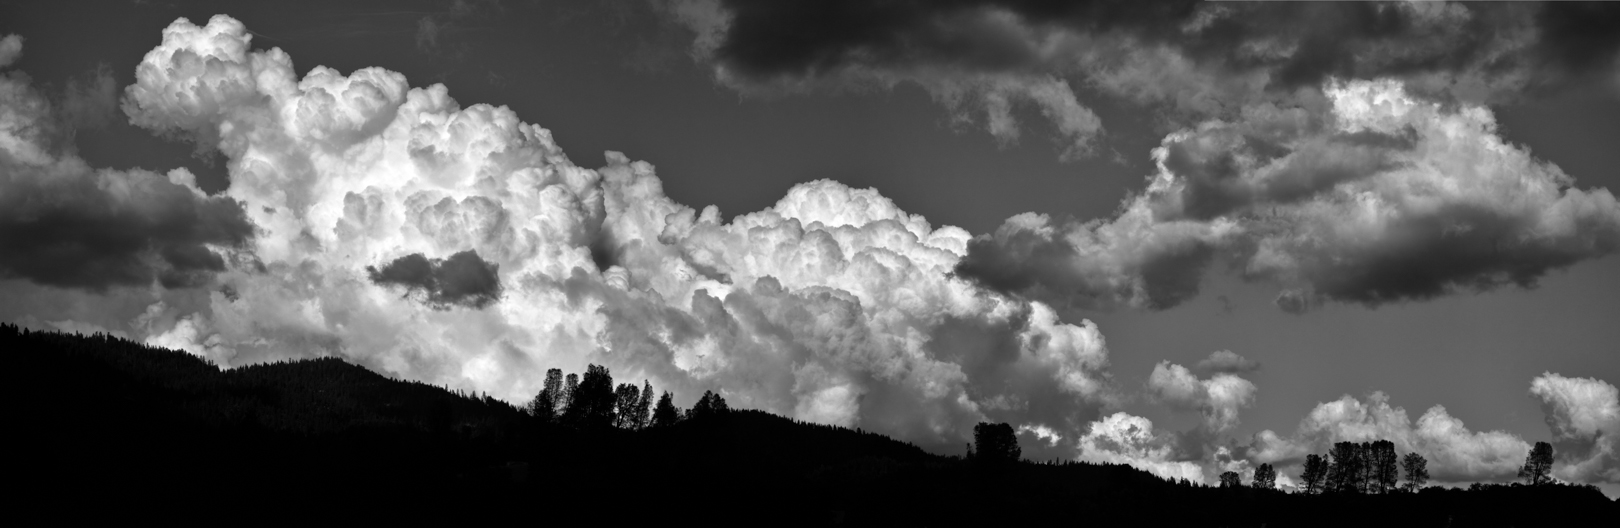 October Clouds-11.jpg